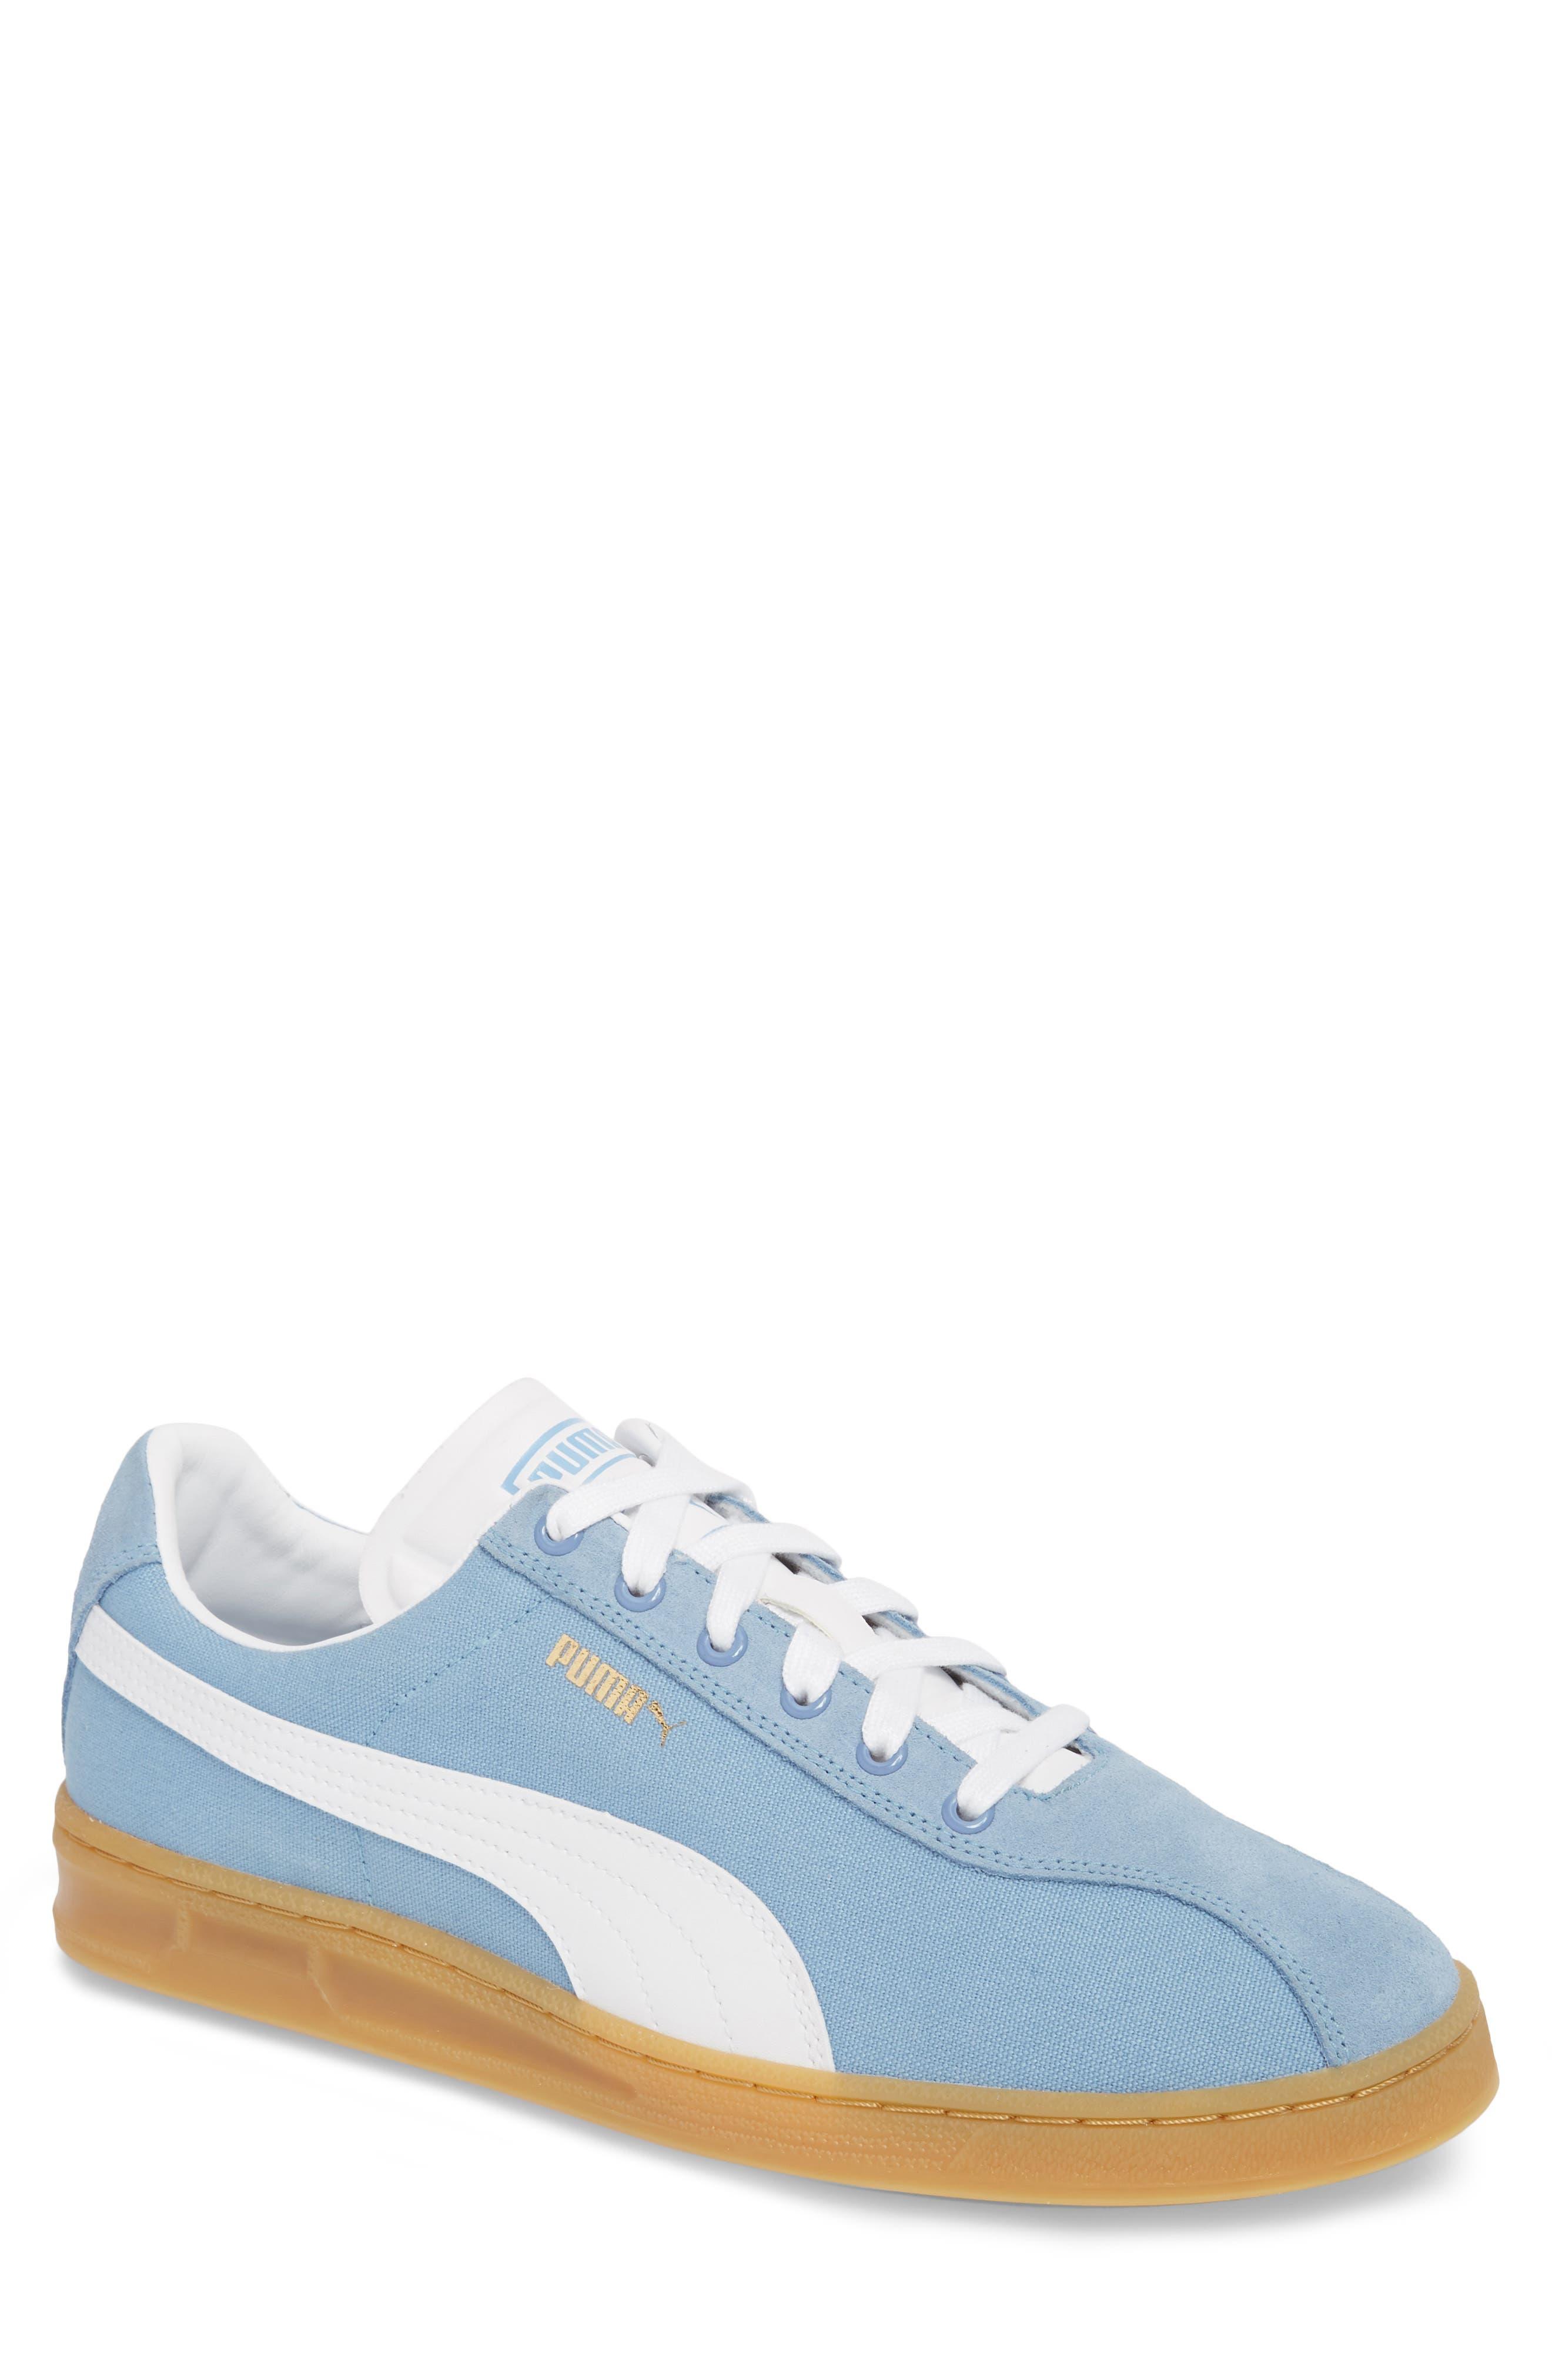 TK Indoor Summer Sneaker,                             Main thumbnail 1, color,                             Allure/ White